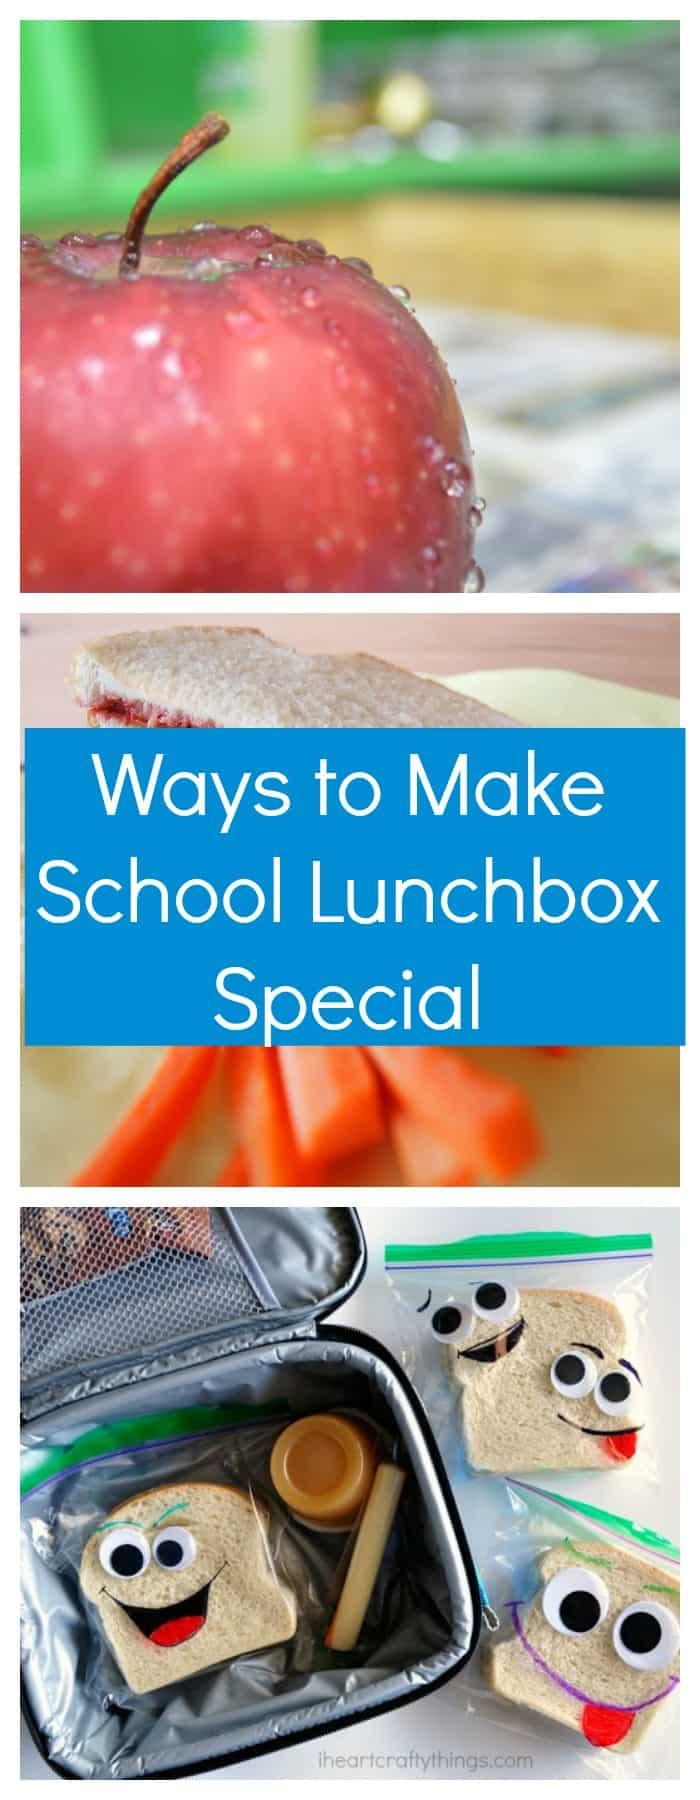 school lunchbox special